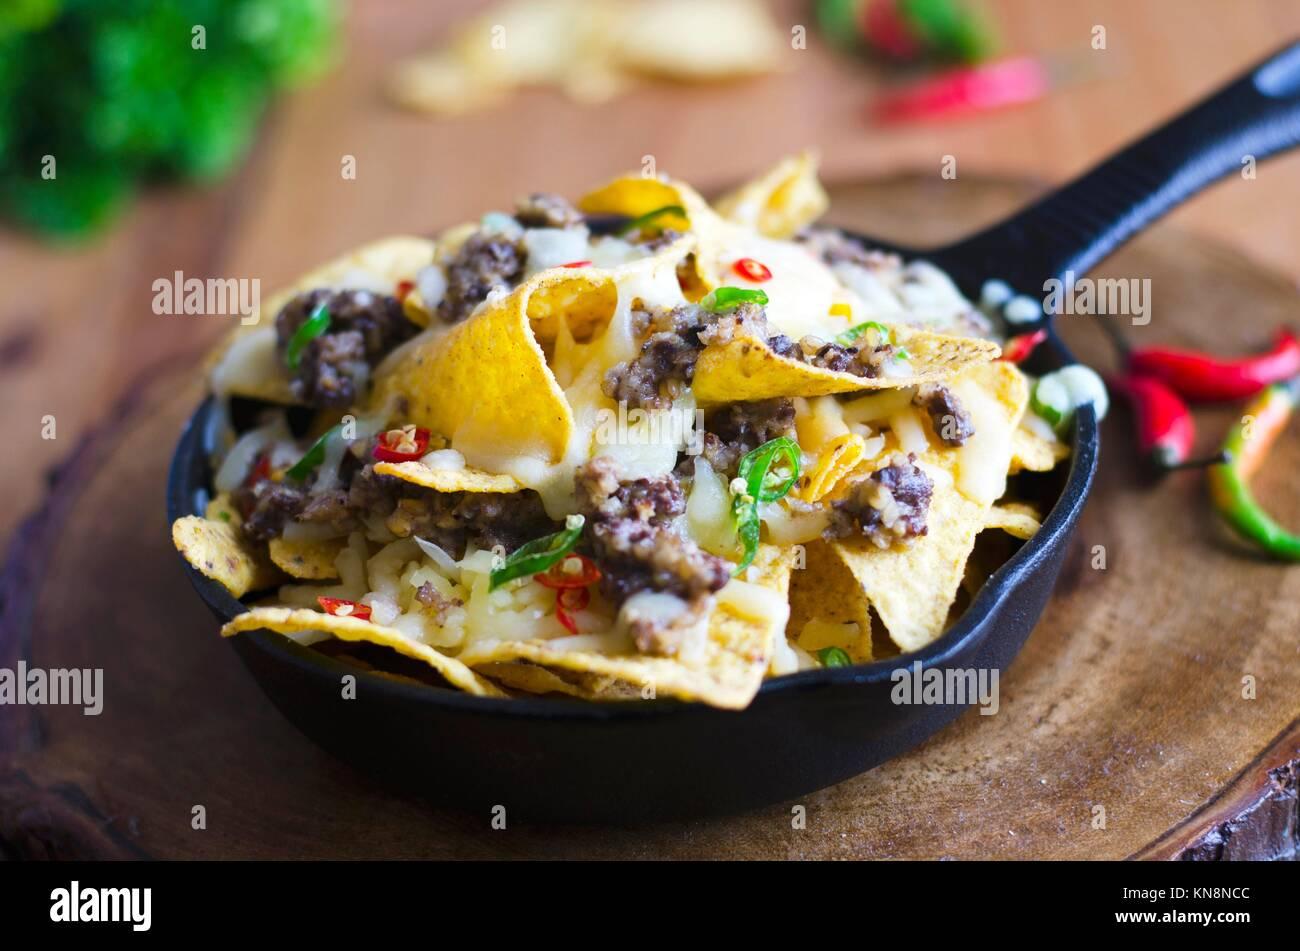 Nachos mit Haggis, geschmolzenem Käse und Paprika. Stockfoto